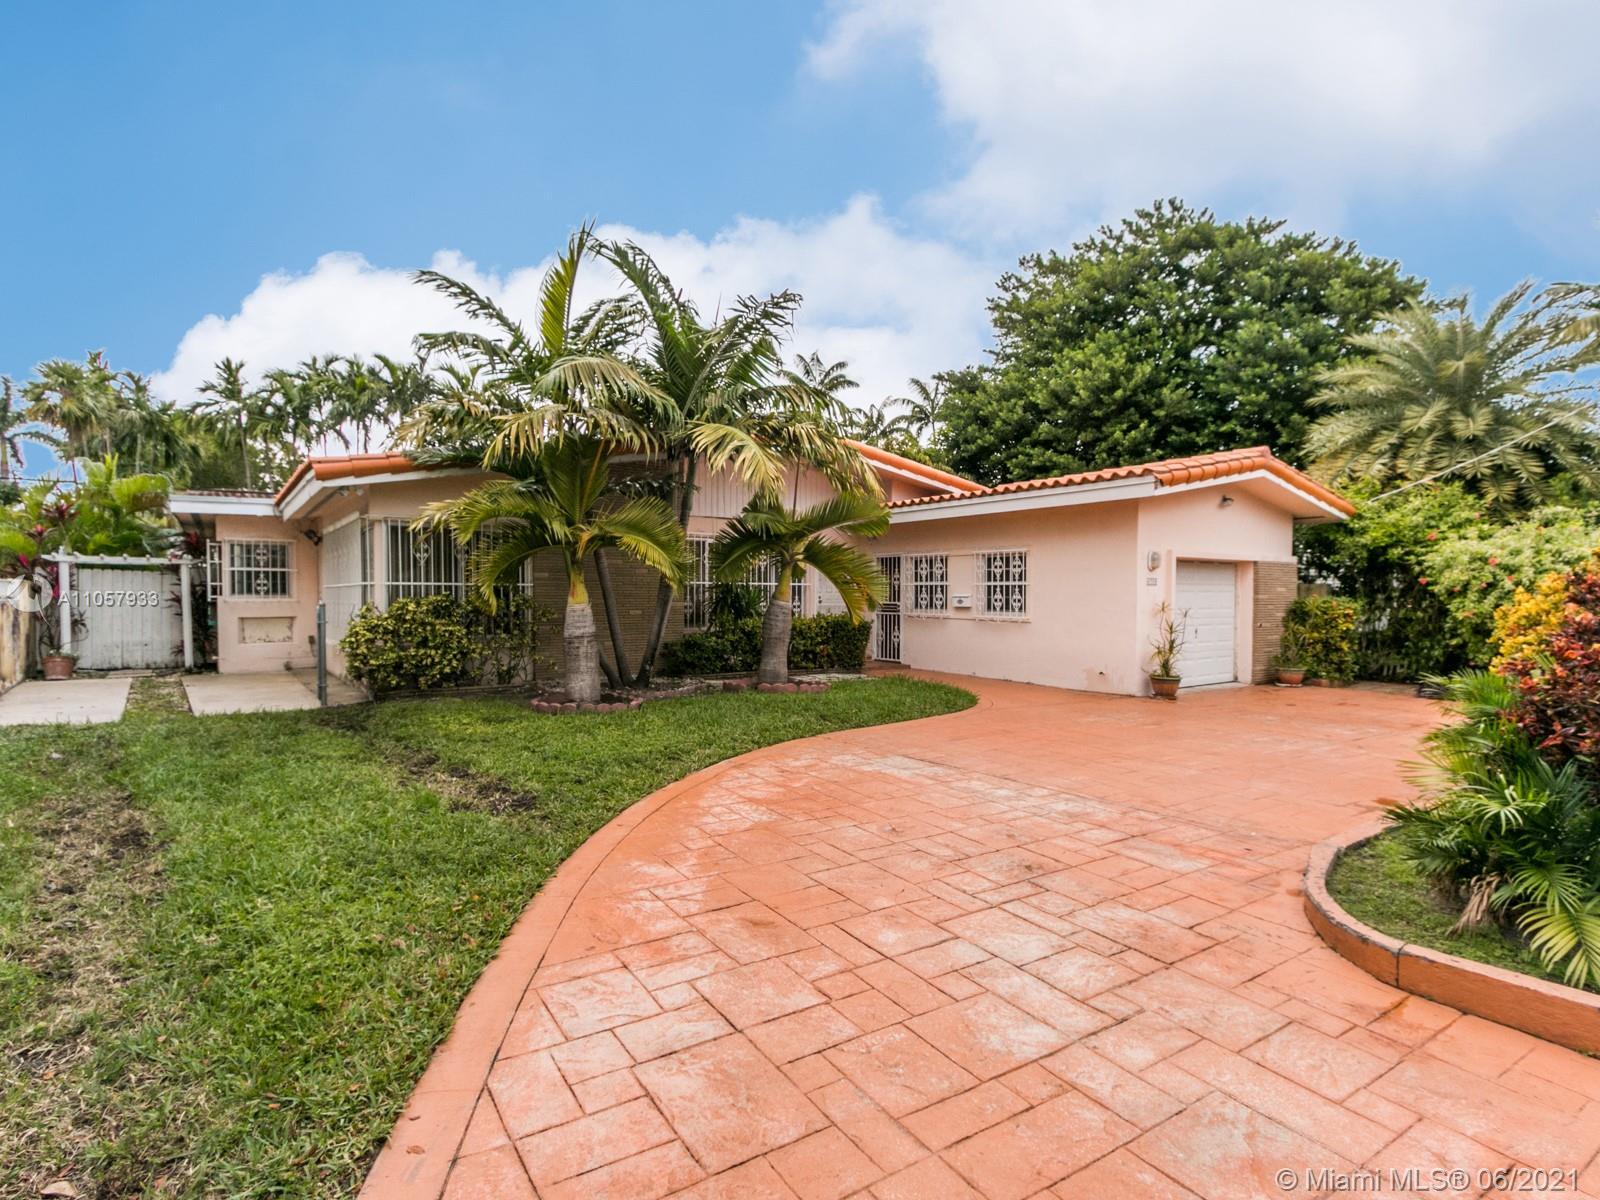 4708  Alton Rd  For Sale A11057933, FL